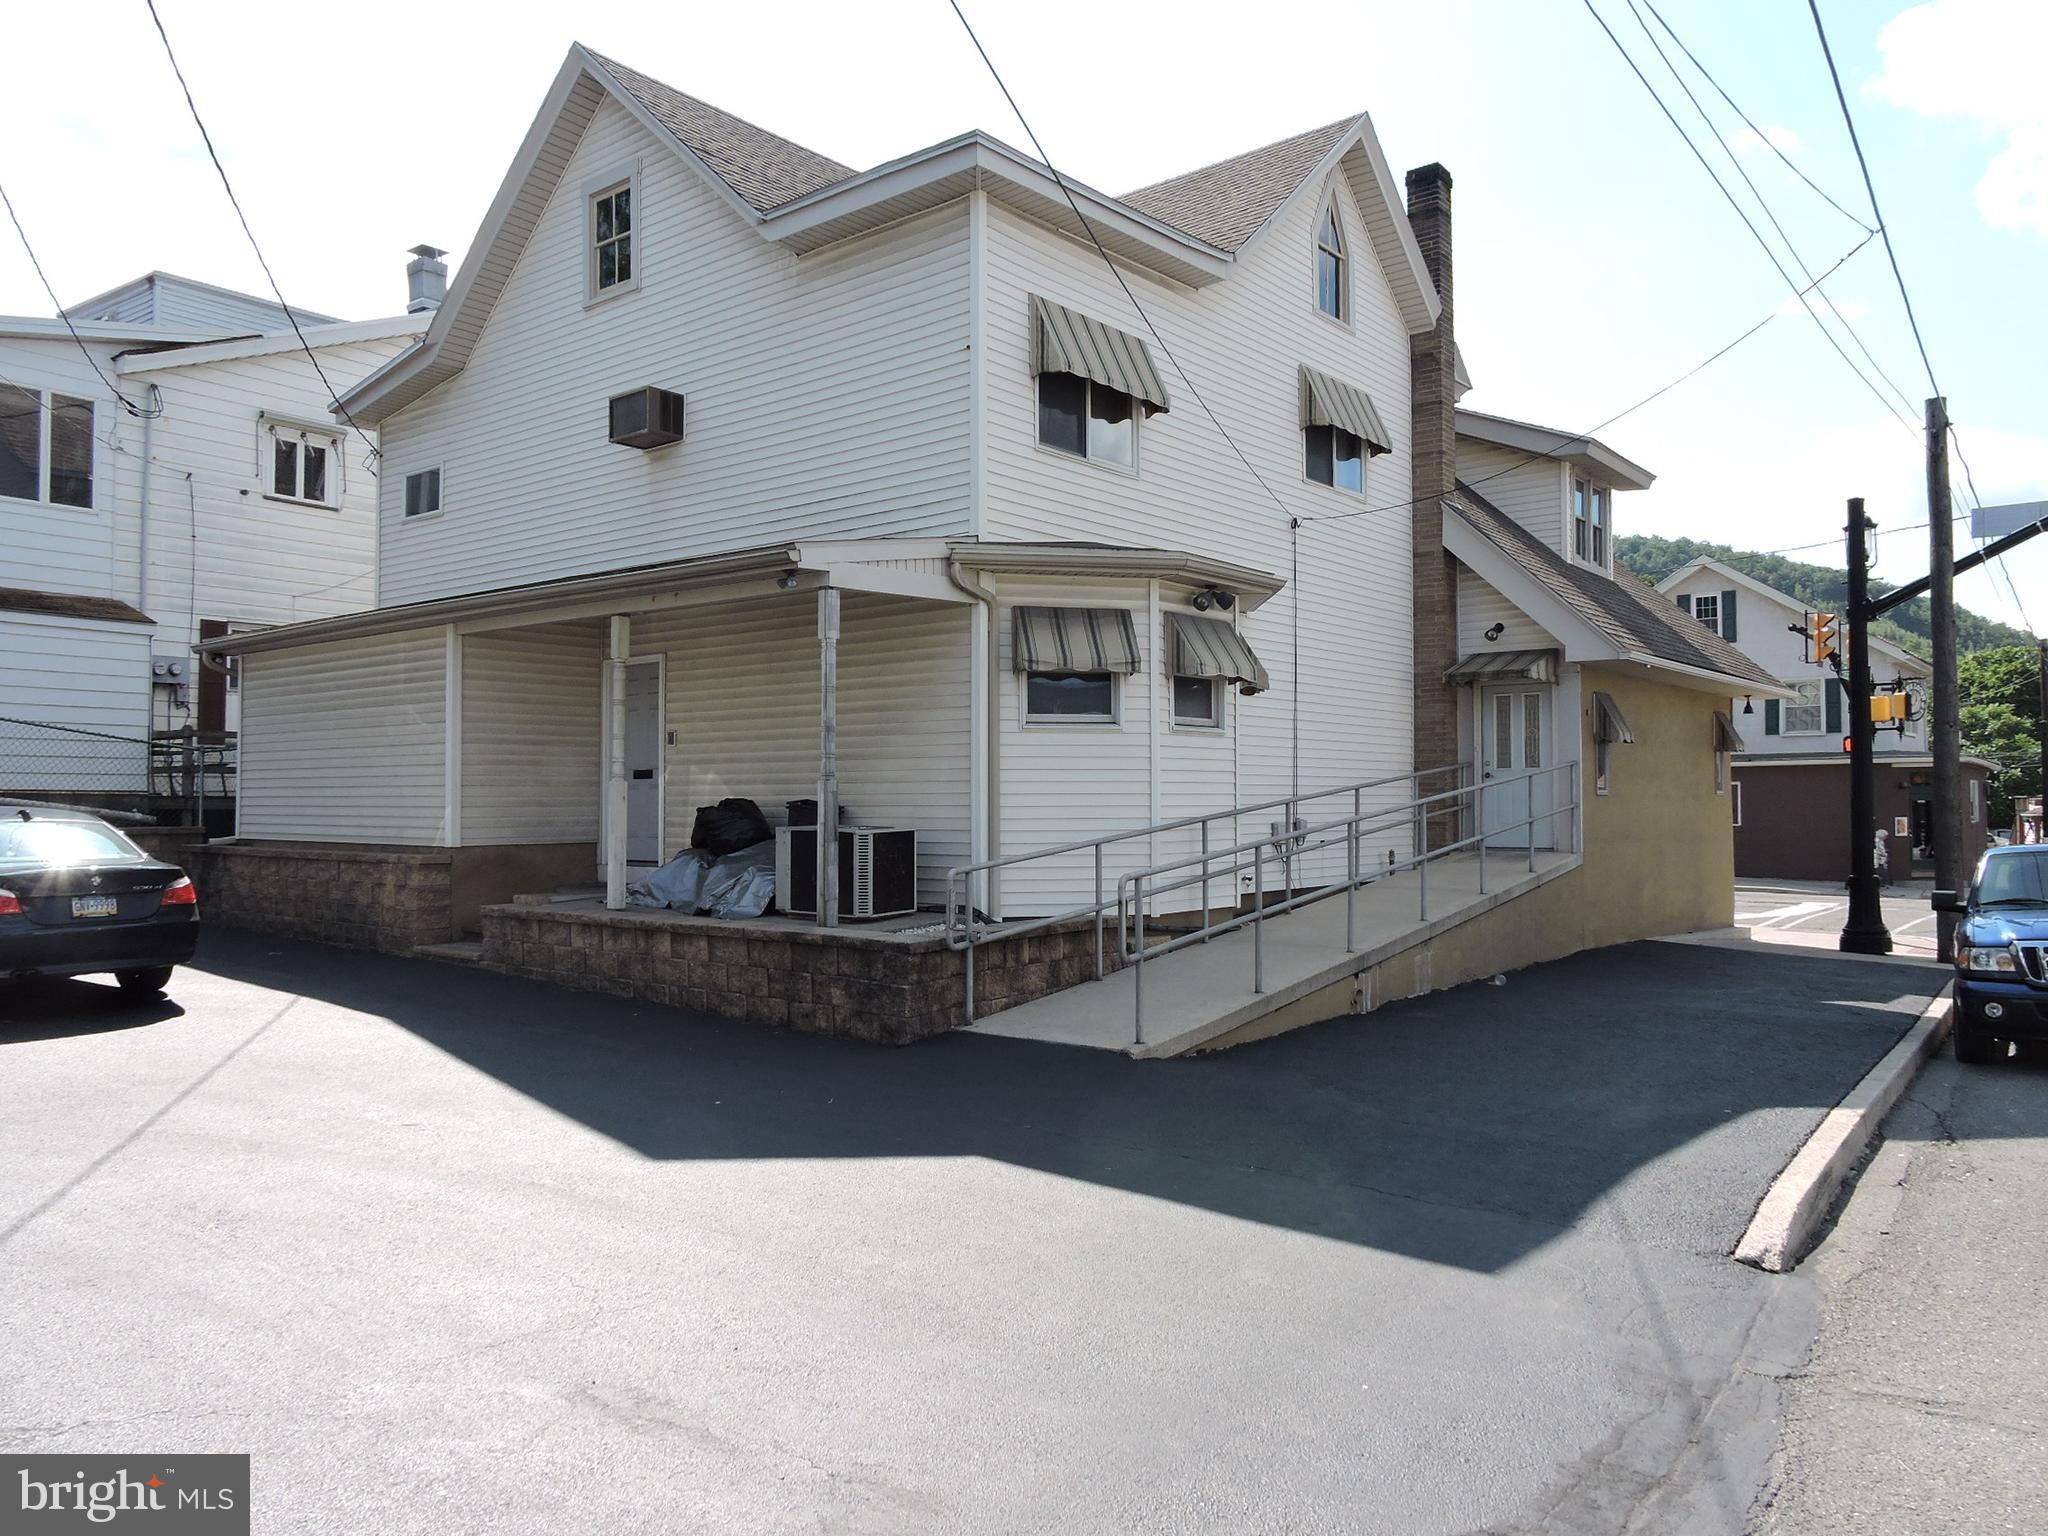 301 E BROAD STREET, TAMAQUA, PA 18252